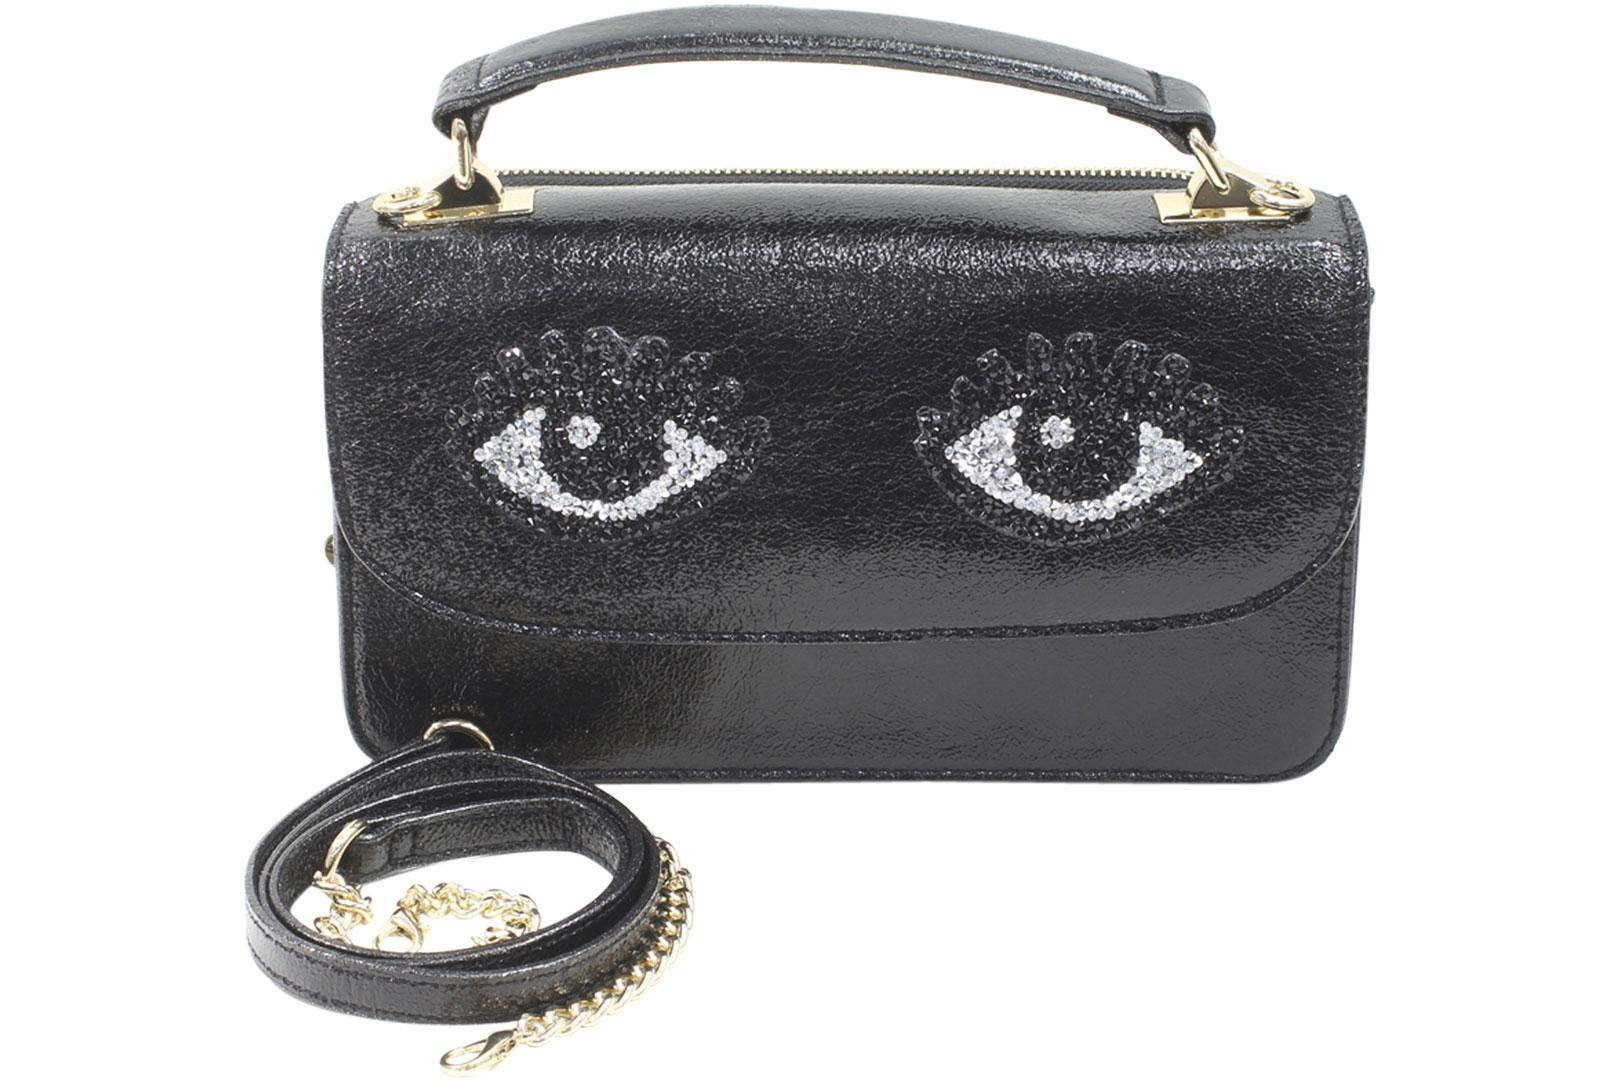 Image of Betsey Johnson Women's Eye Catching Top Handle Crossbody Handbag - Black